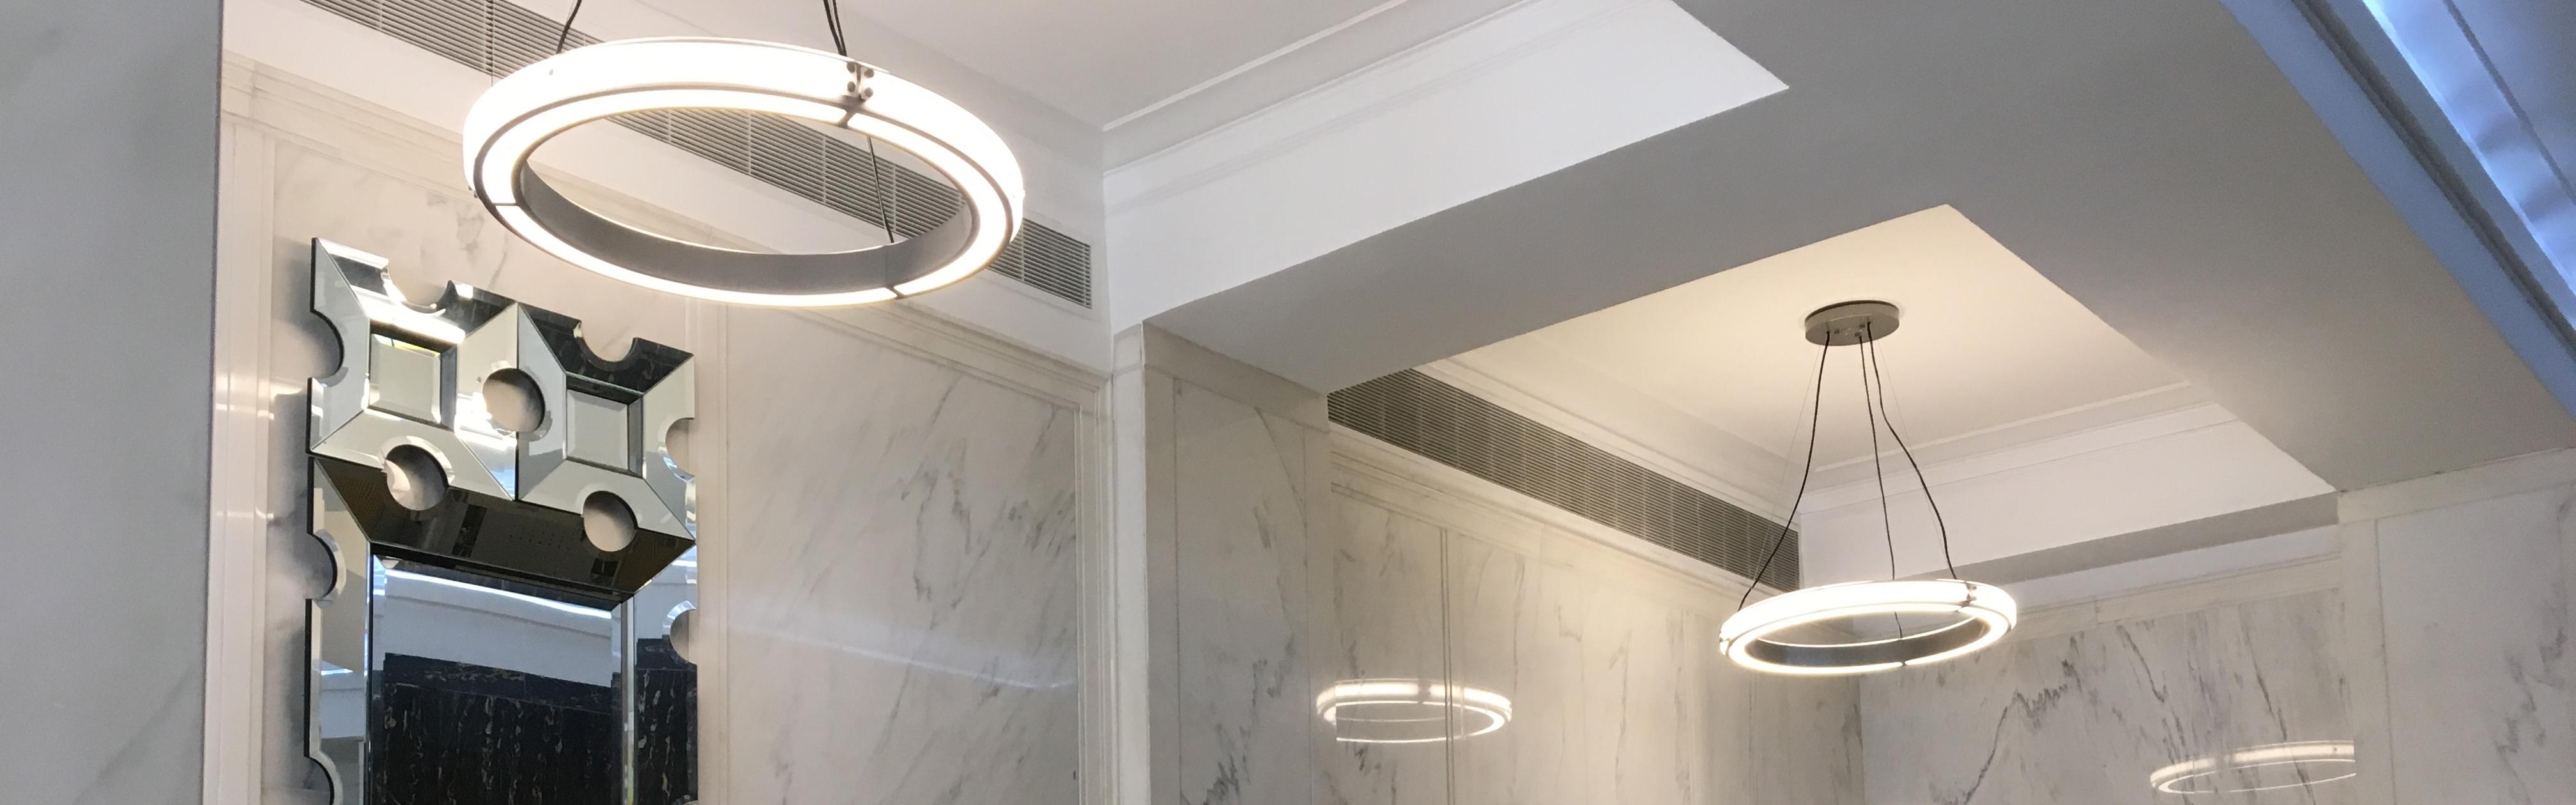 Decorative lighting light fixtures ultralights lighting side764 arubaitofo Image collections